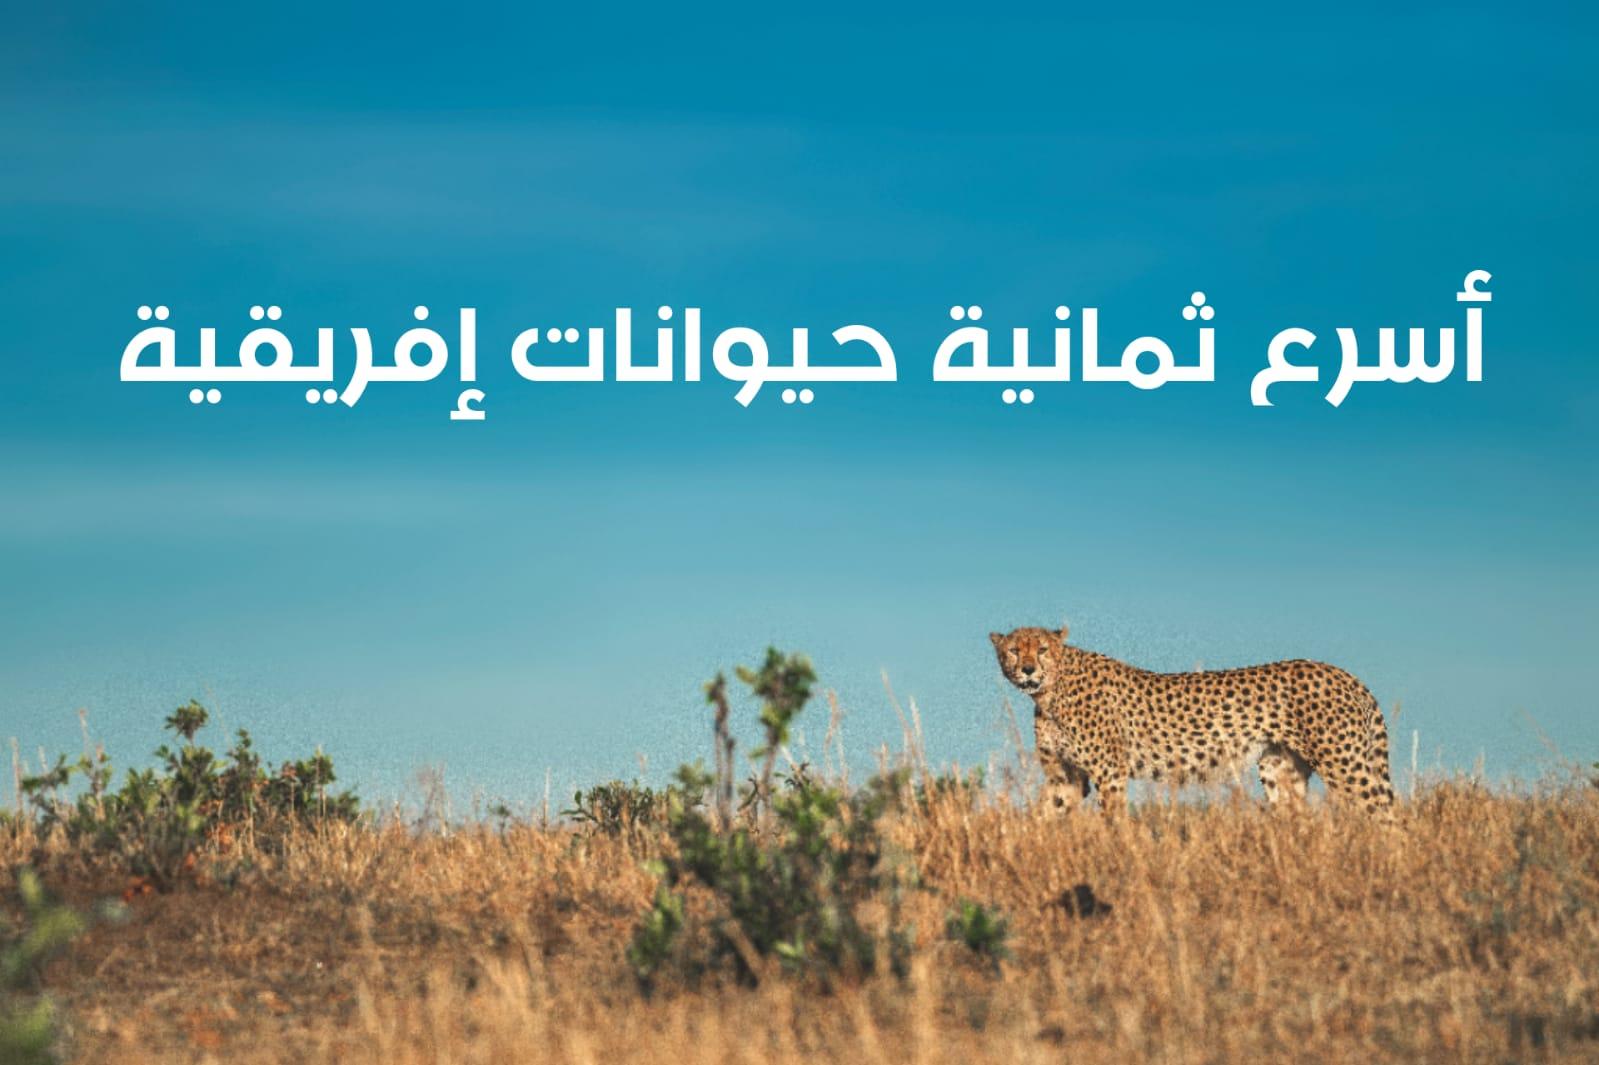 WhatsApp Image 2020 06 09 at 12.14.03 PM - أسرع الحيوانات في إفريقيا